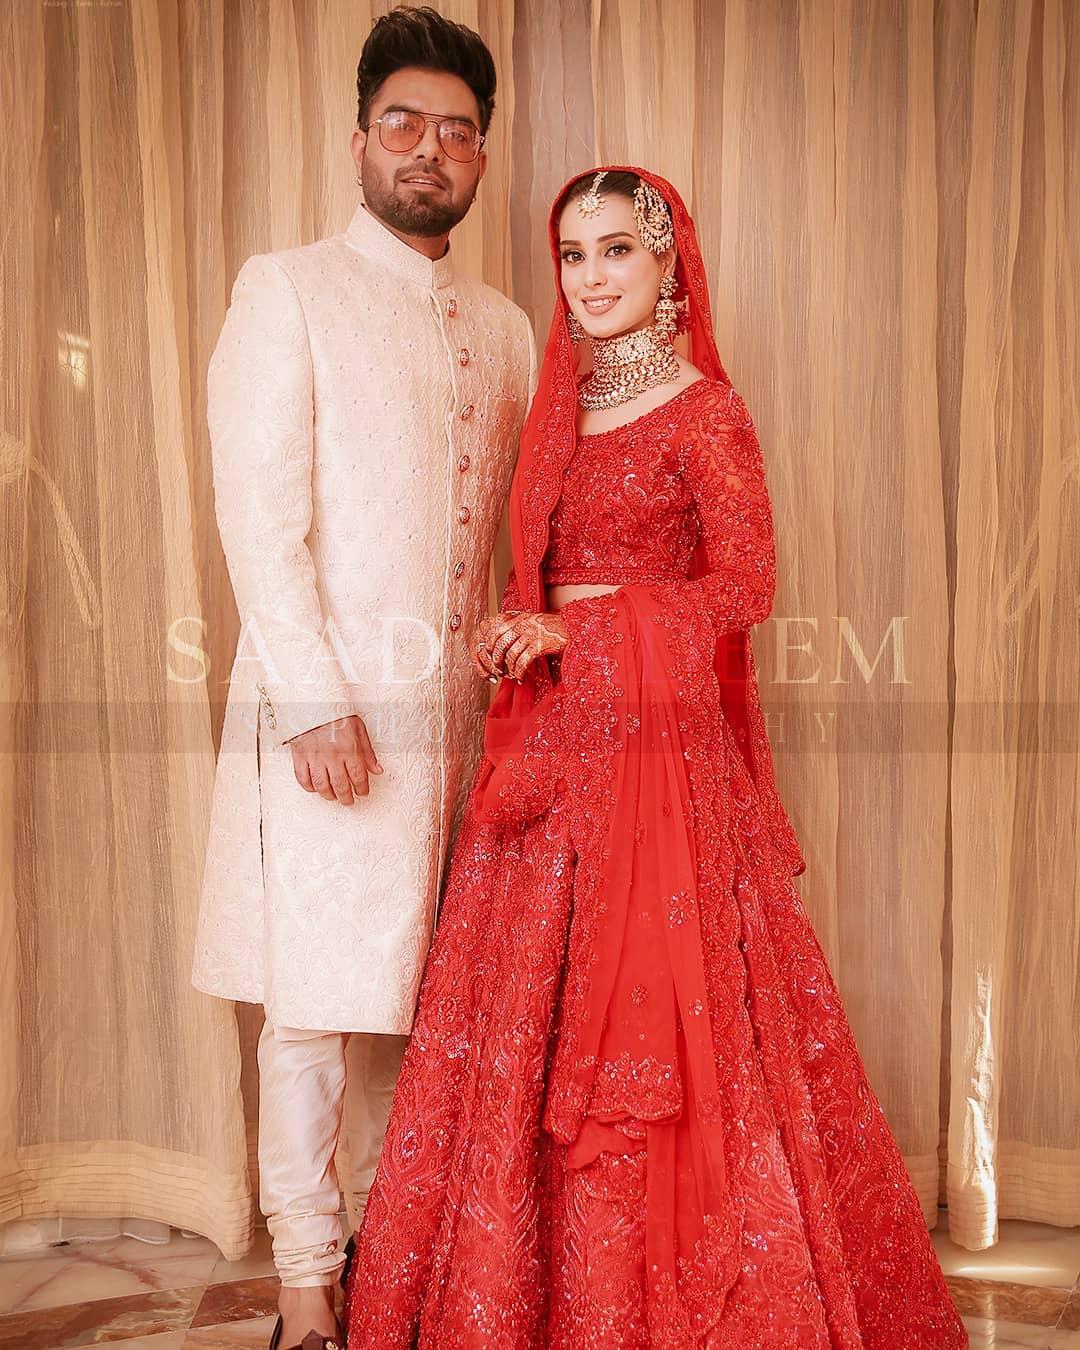 Iqra Aziz and Yasir Hussain Wedding Pictures (24)